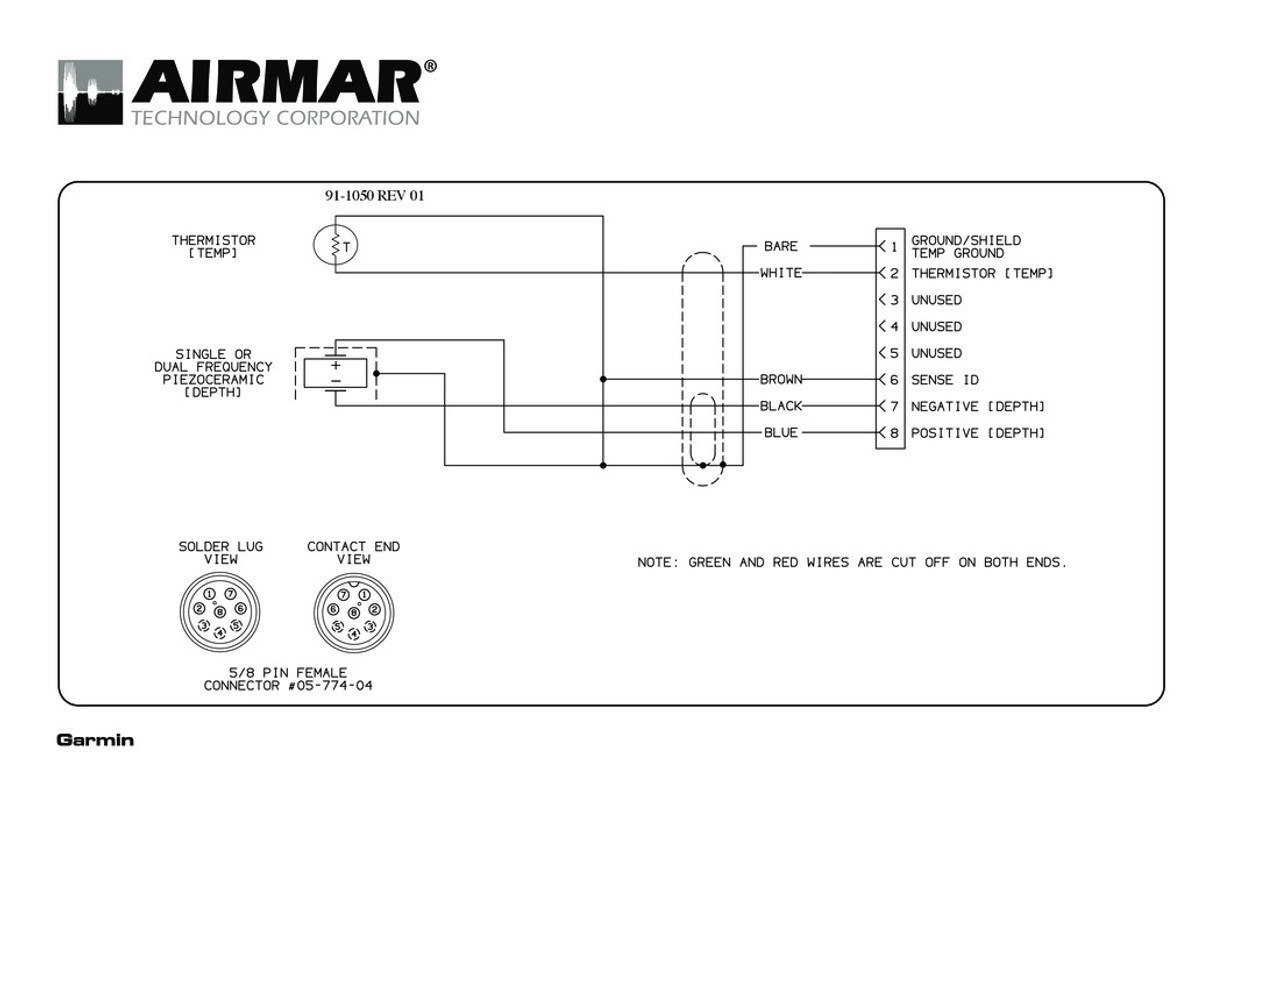 small resolution of airmar wiring diagram garmin p319 8 pin d t blue bottle marine garmin marine gps wiring diagram garmin marine wiring diagram